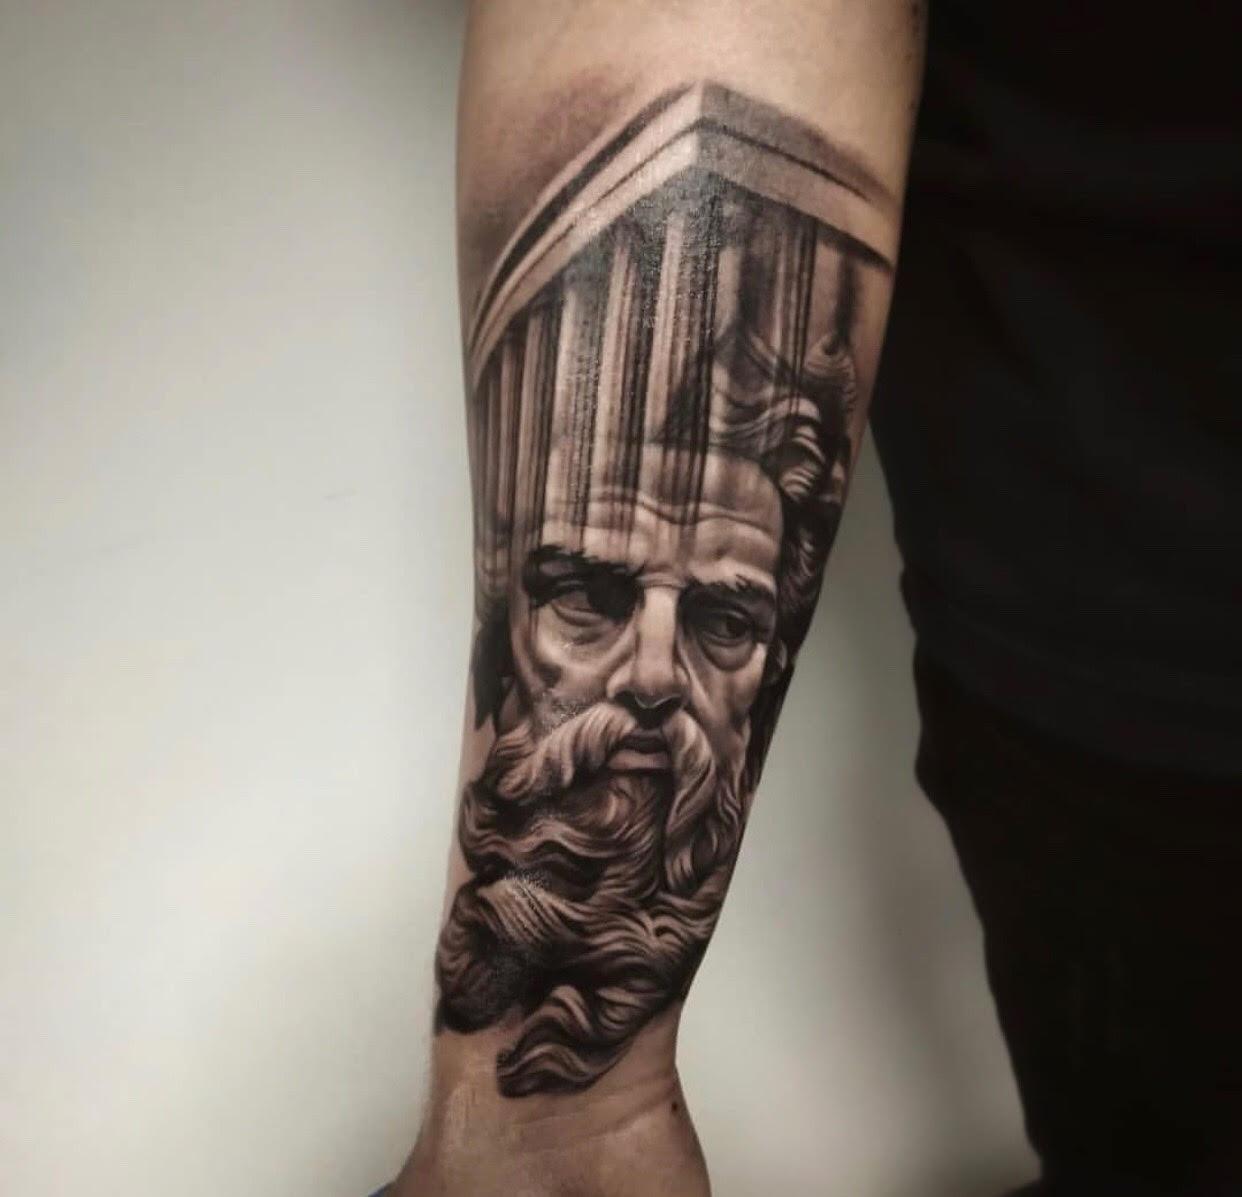 Custom-black-and-grey-Greek God Zeus tattoo-by-+Bryan+Alfaro+at-certified-customs-denver-co-12.jpg